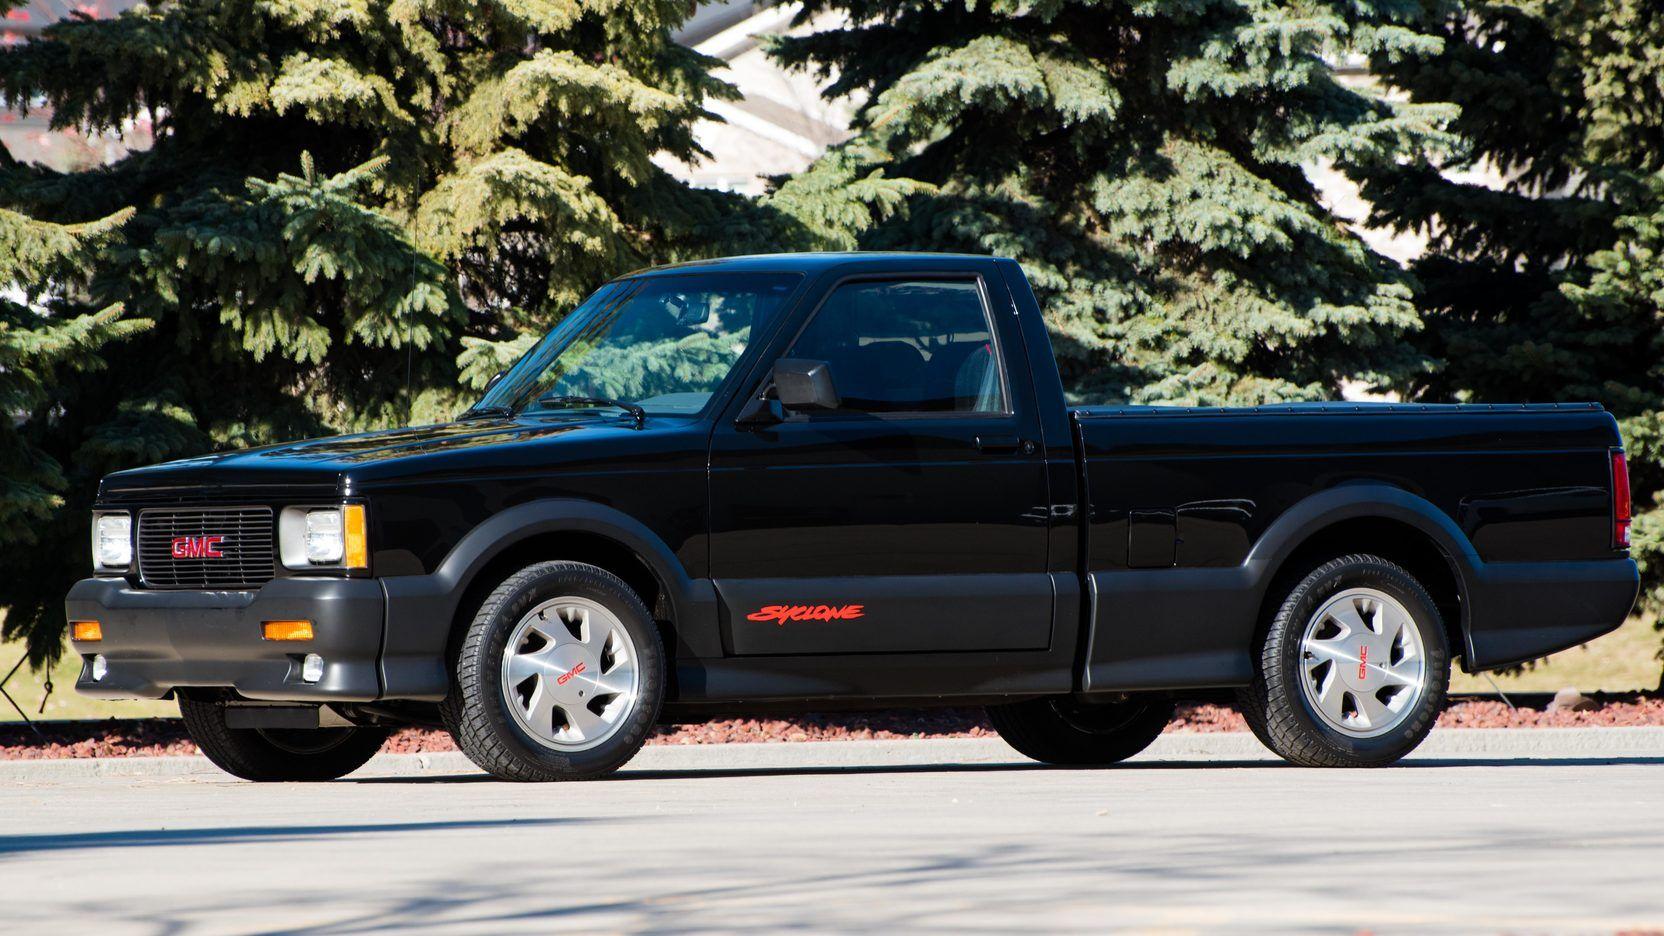 1991 Gmc Syclone Pickup Gmc Gmc Trucks Kissimmee